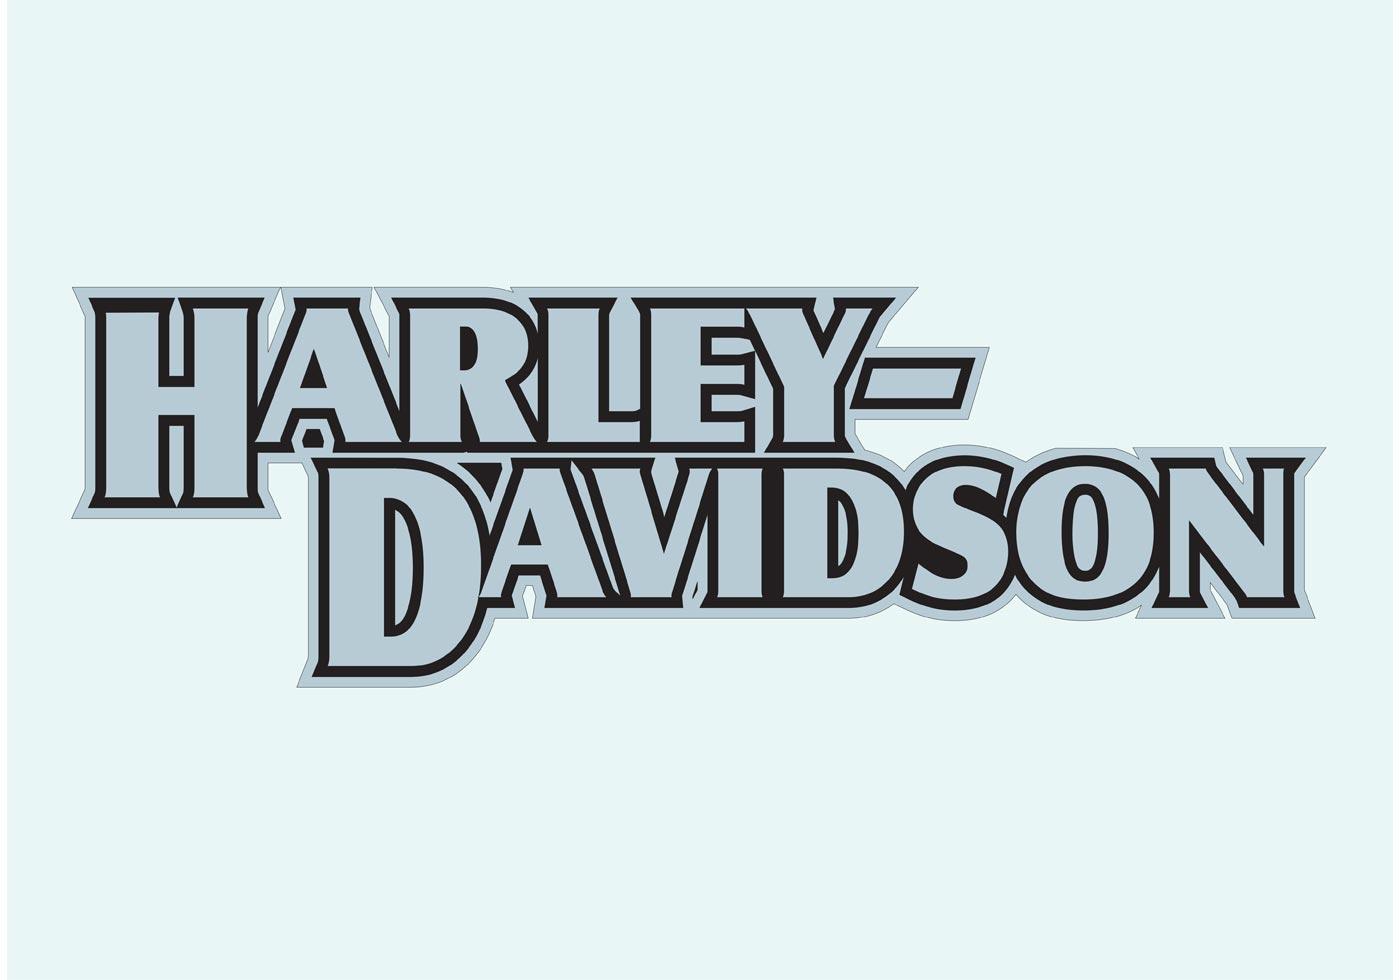 Harley Davidson Logo Graphics - Download Free Vector Art ... - photo#19